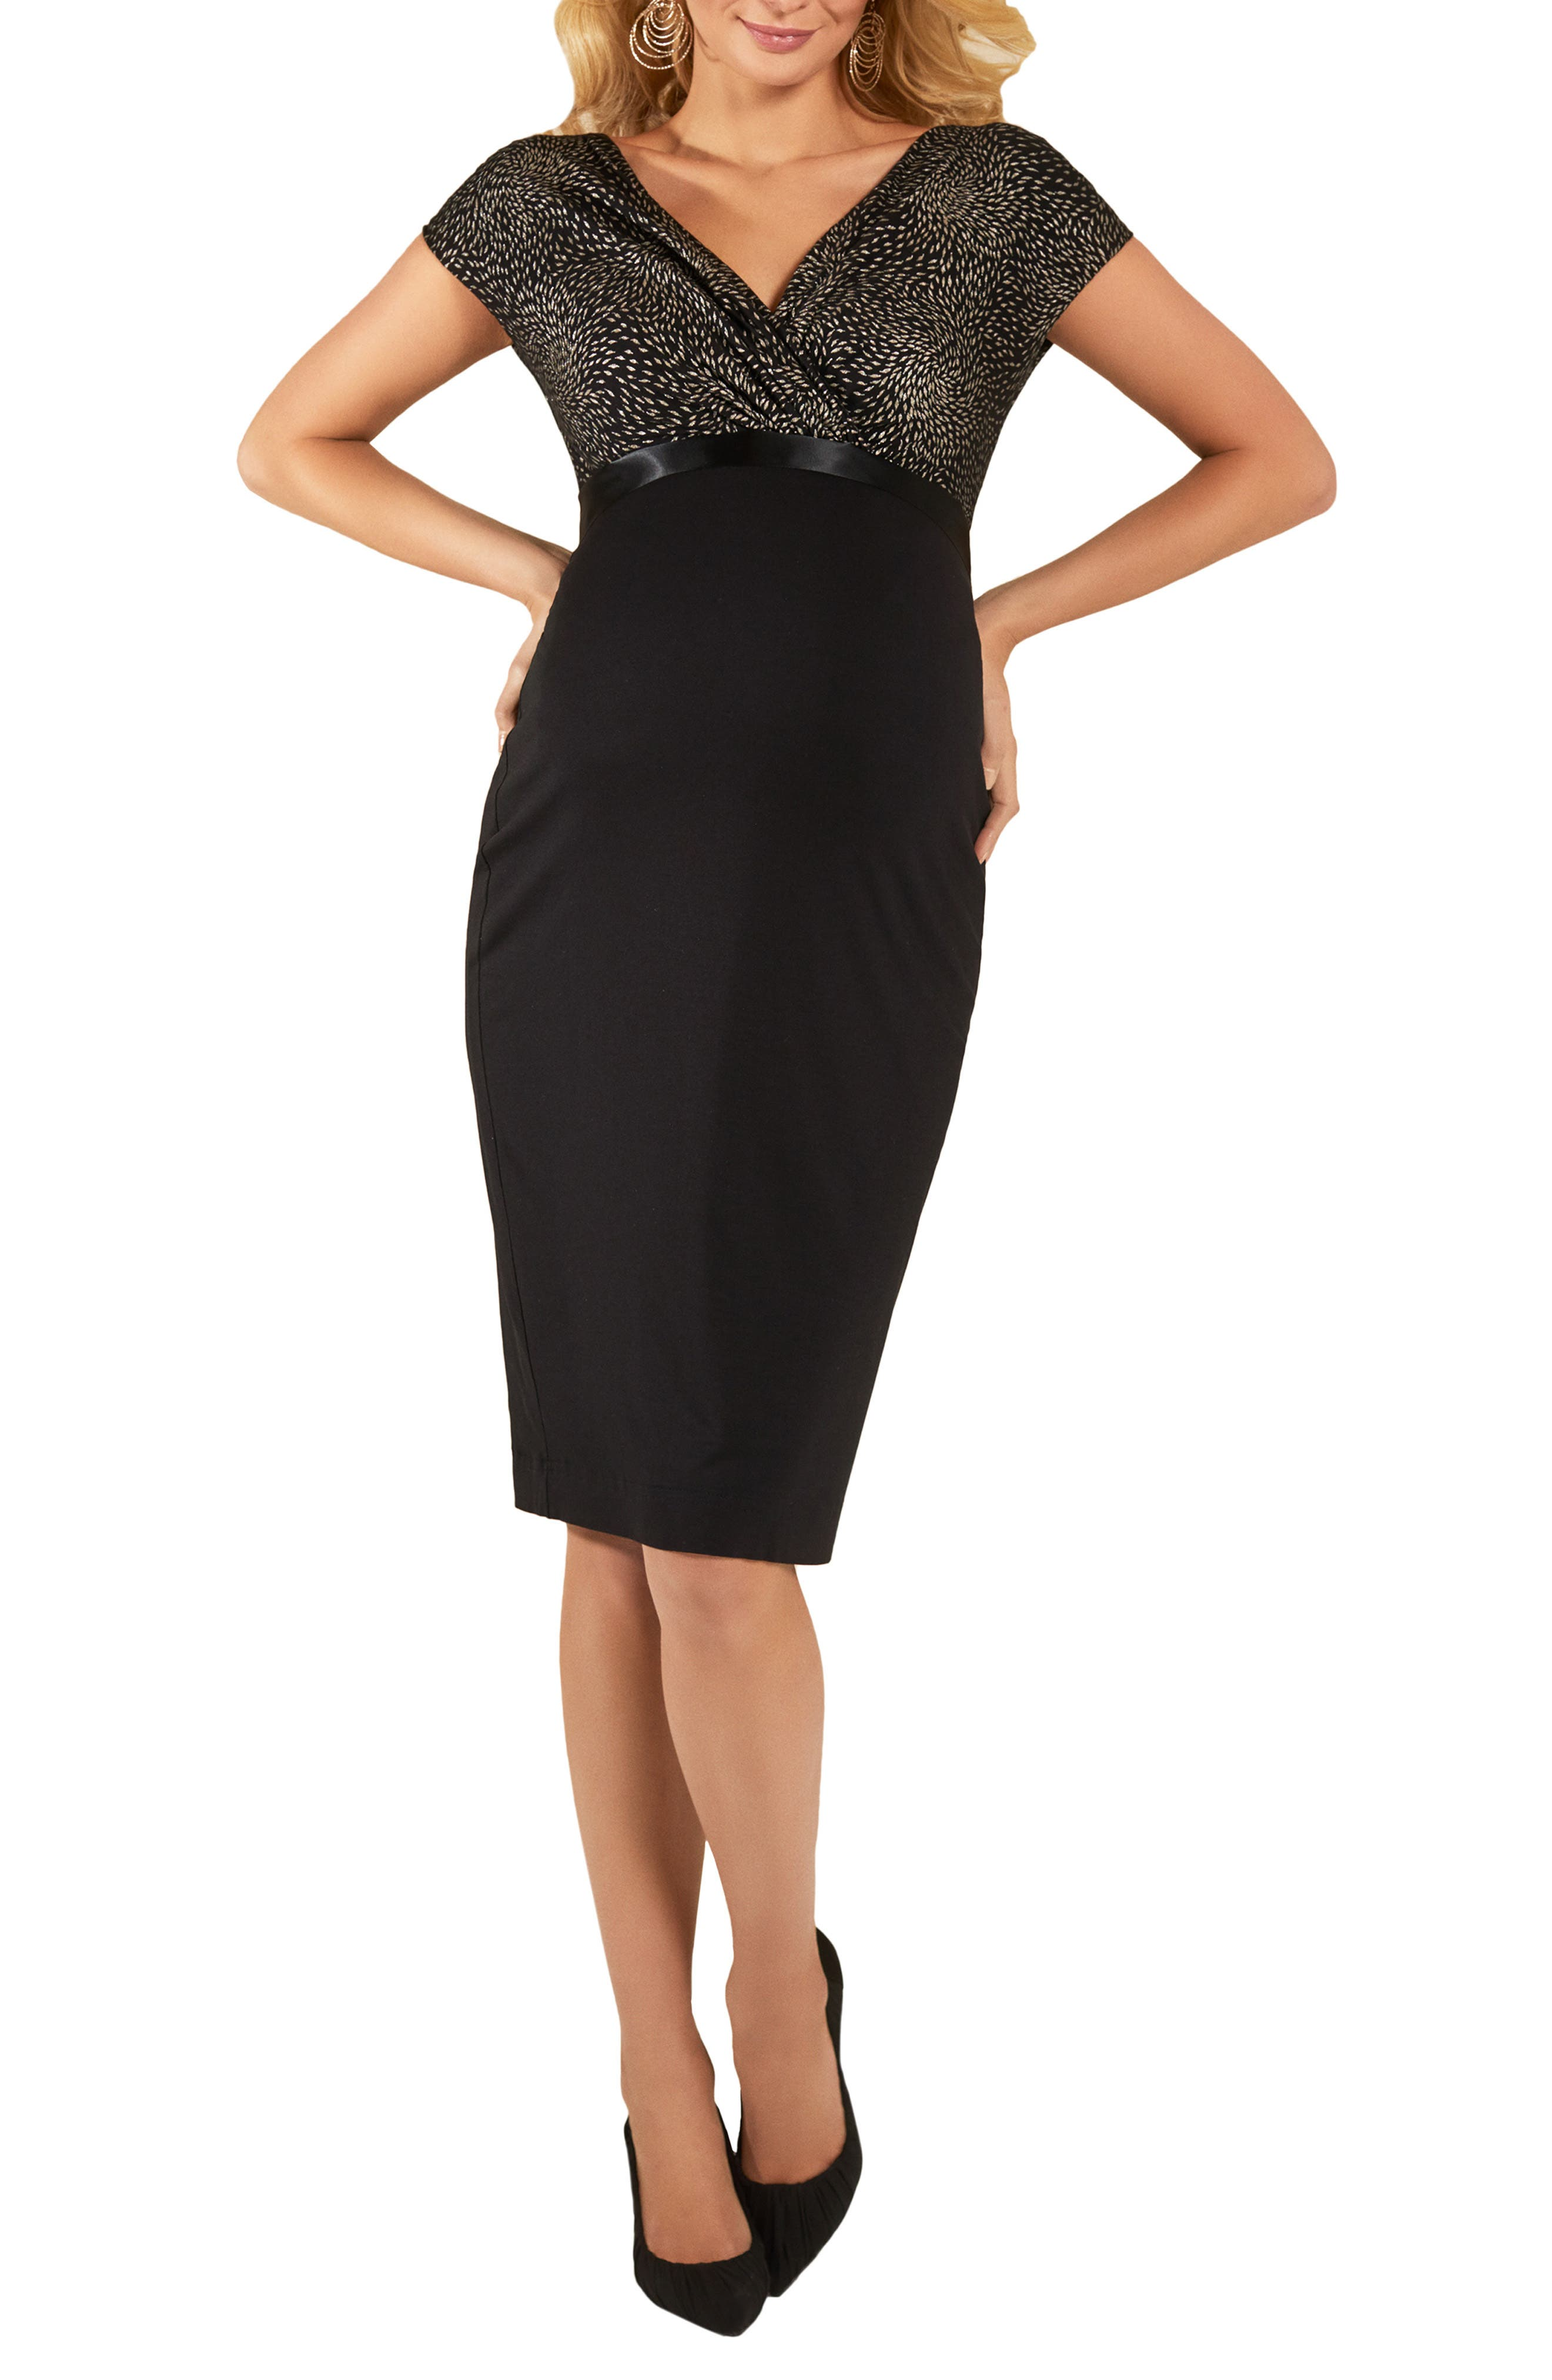 Tiffany Rose Maternity Sheath Dress, Metallic